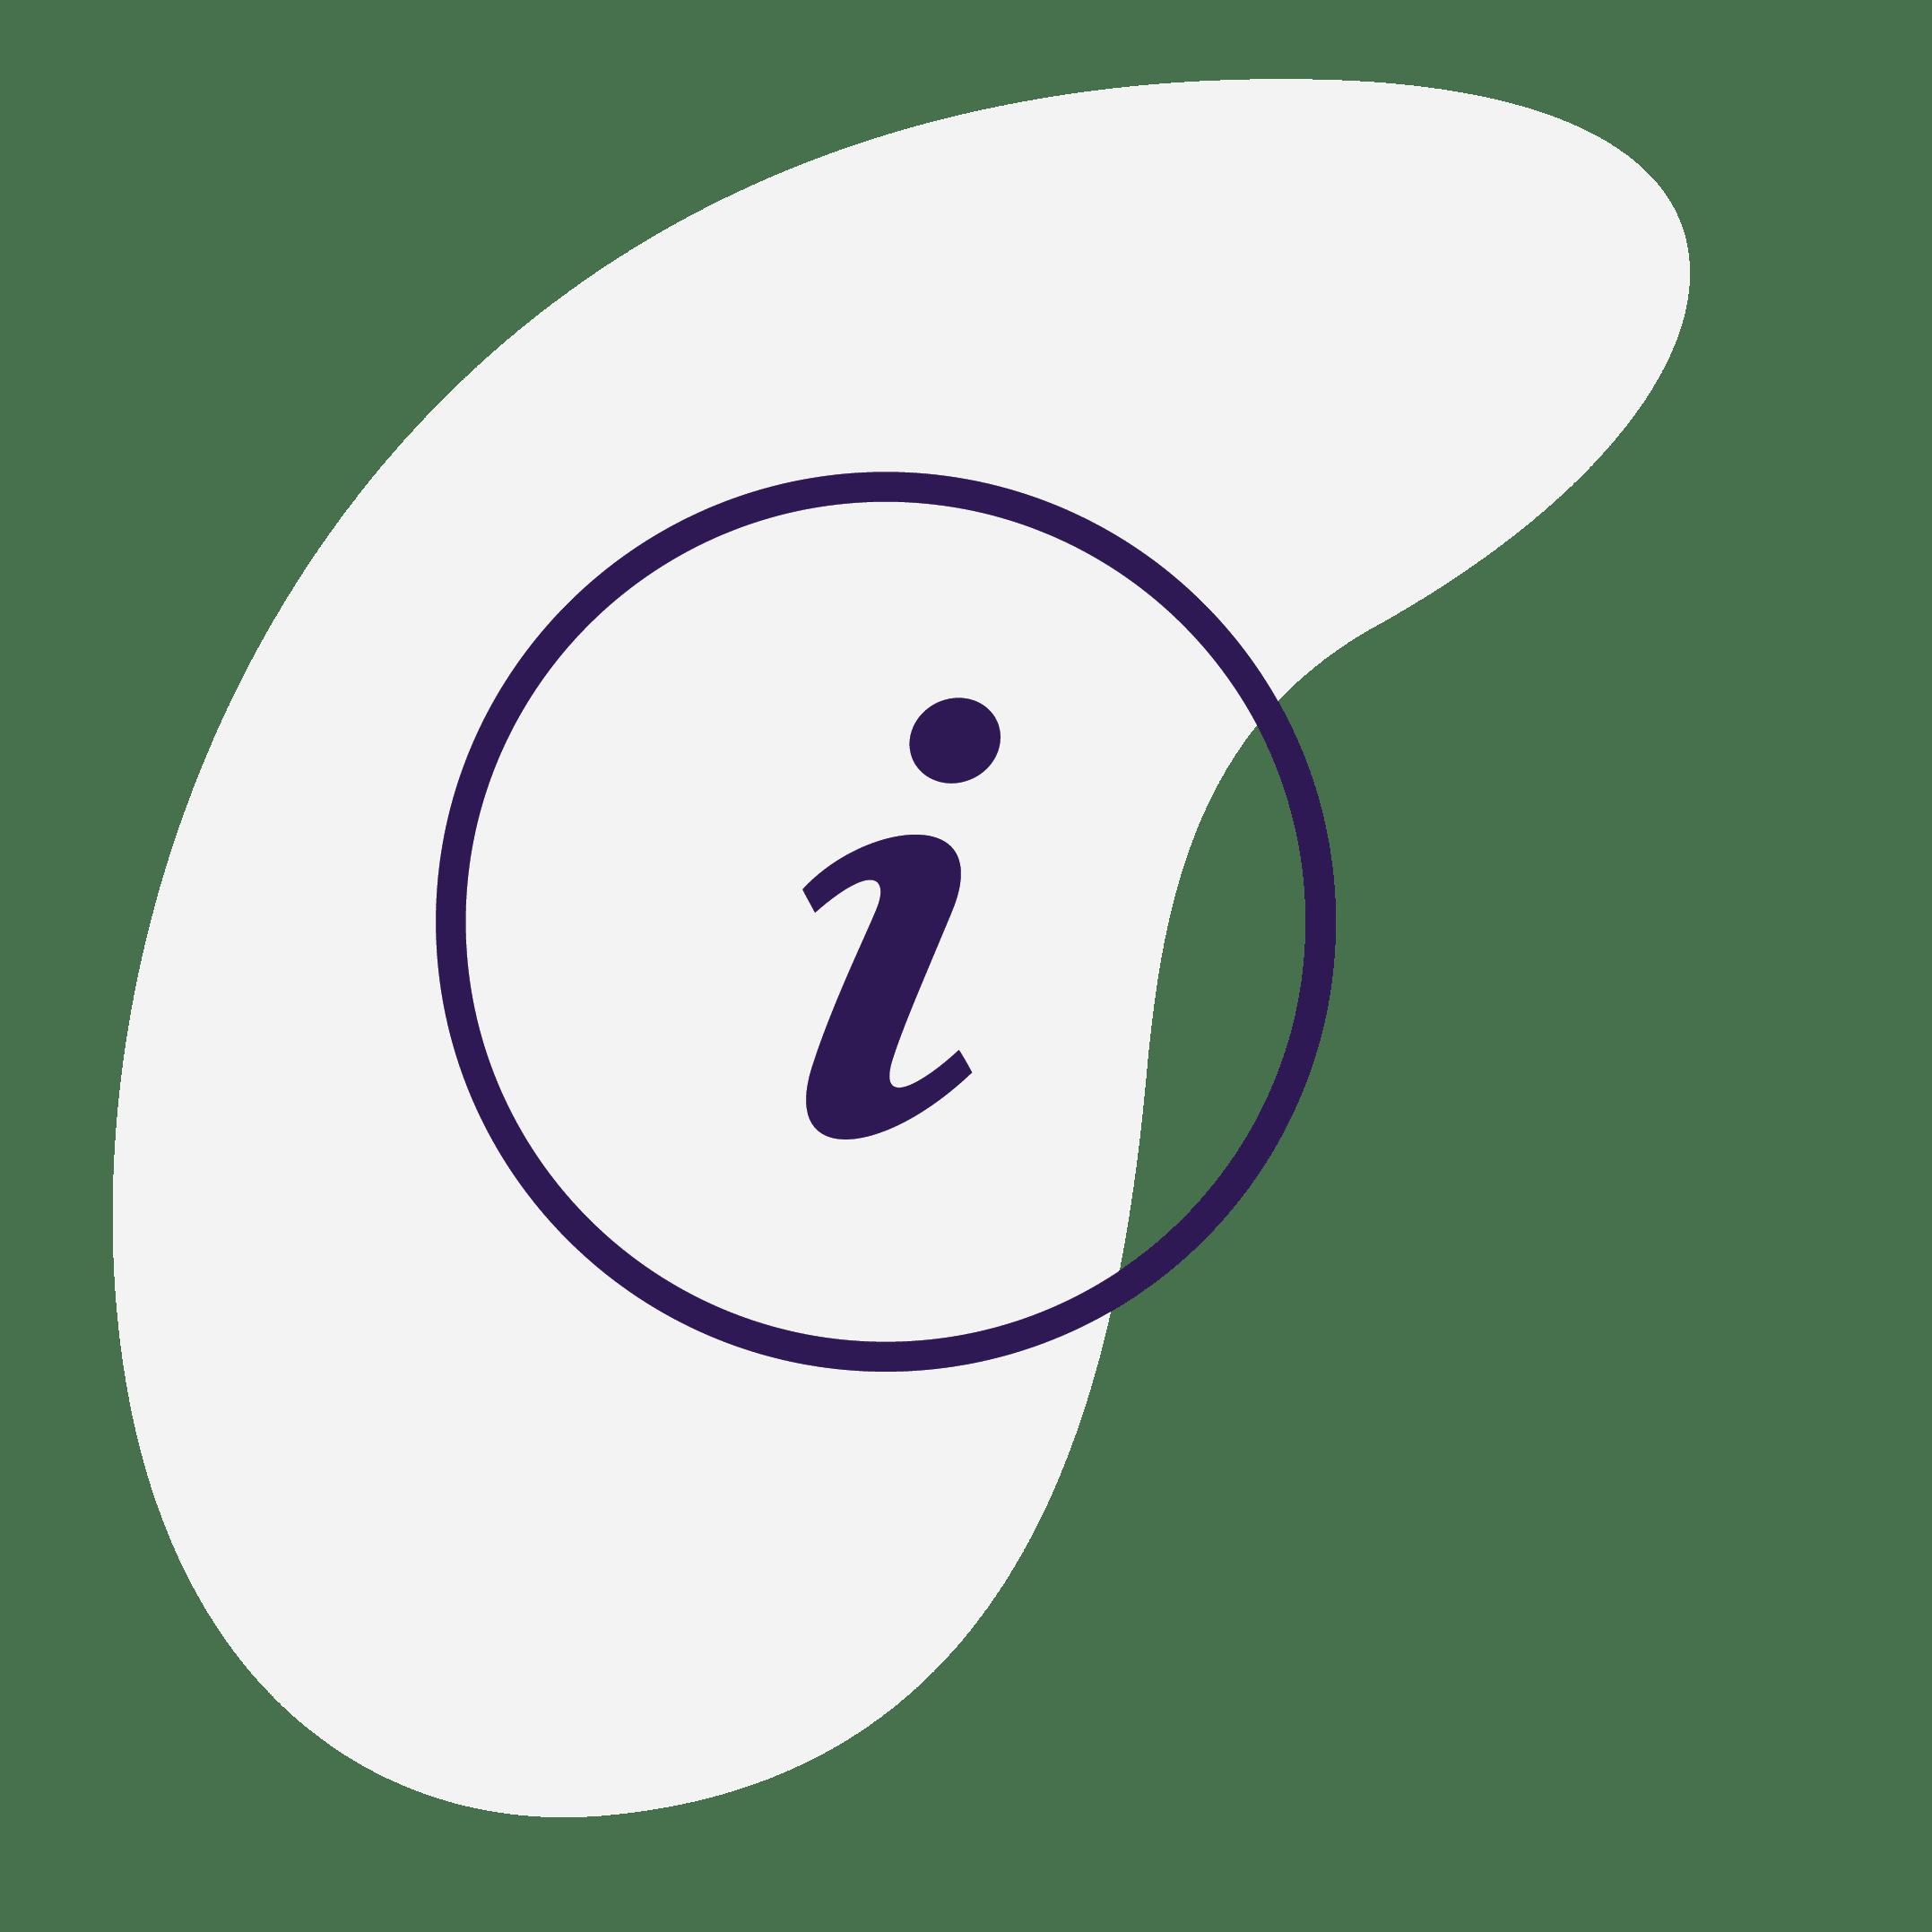 Covid-19 Response Iconography 25